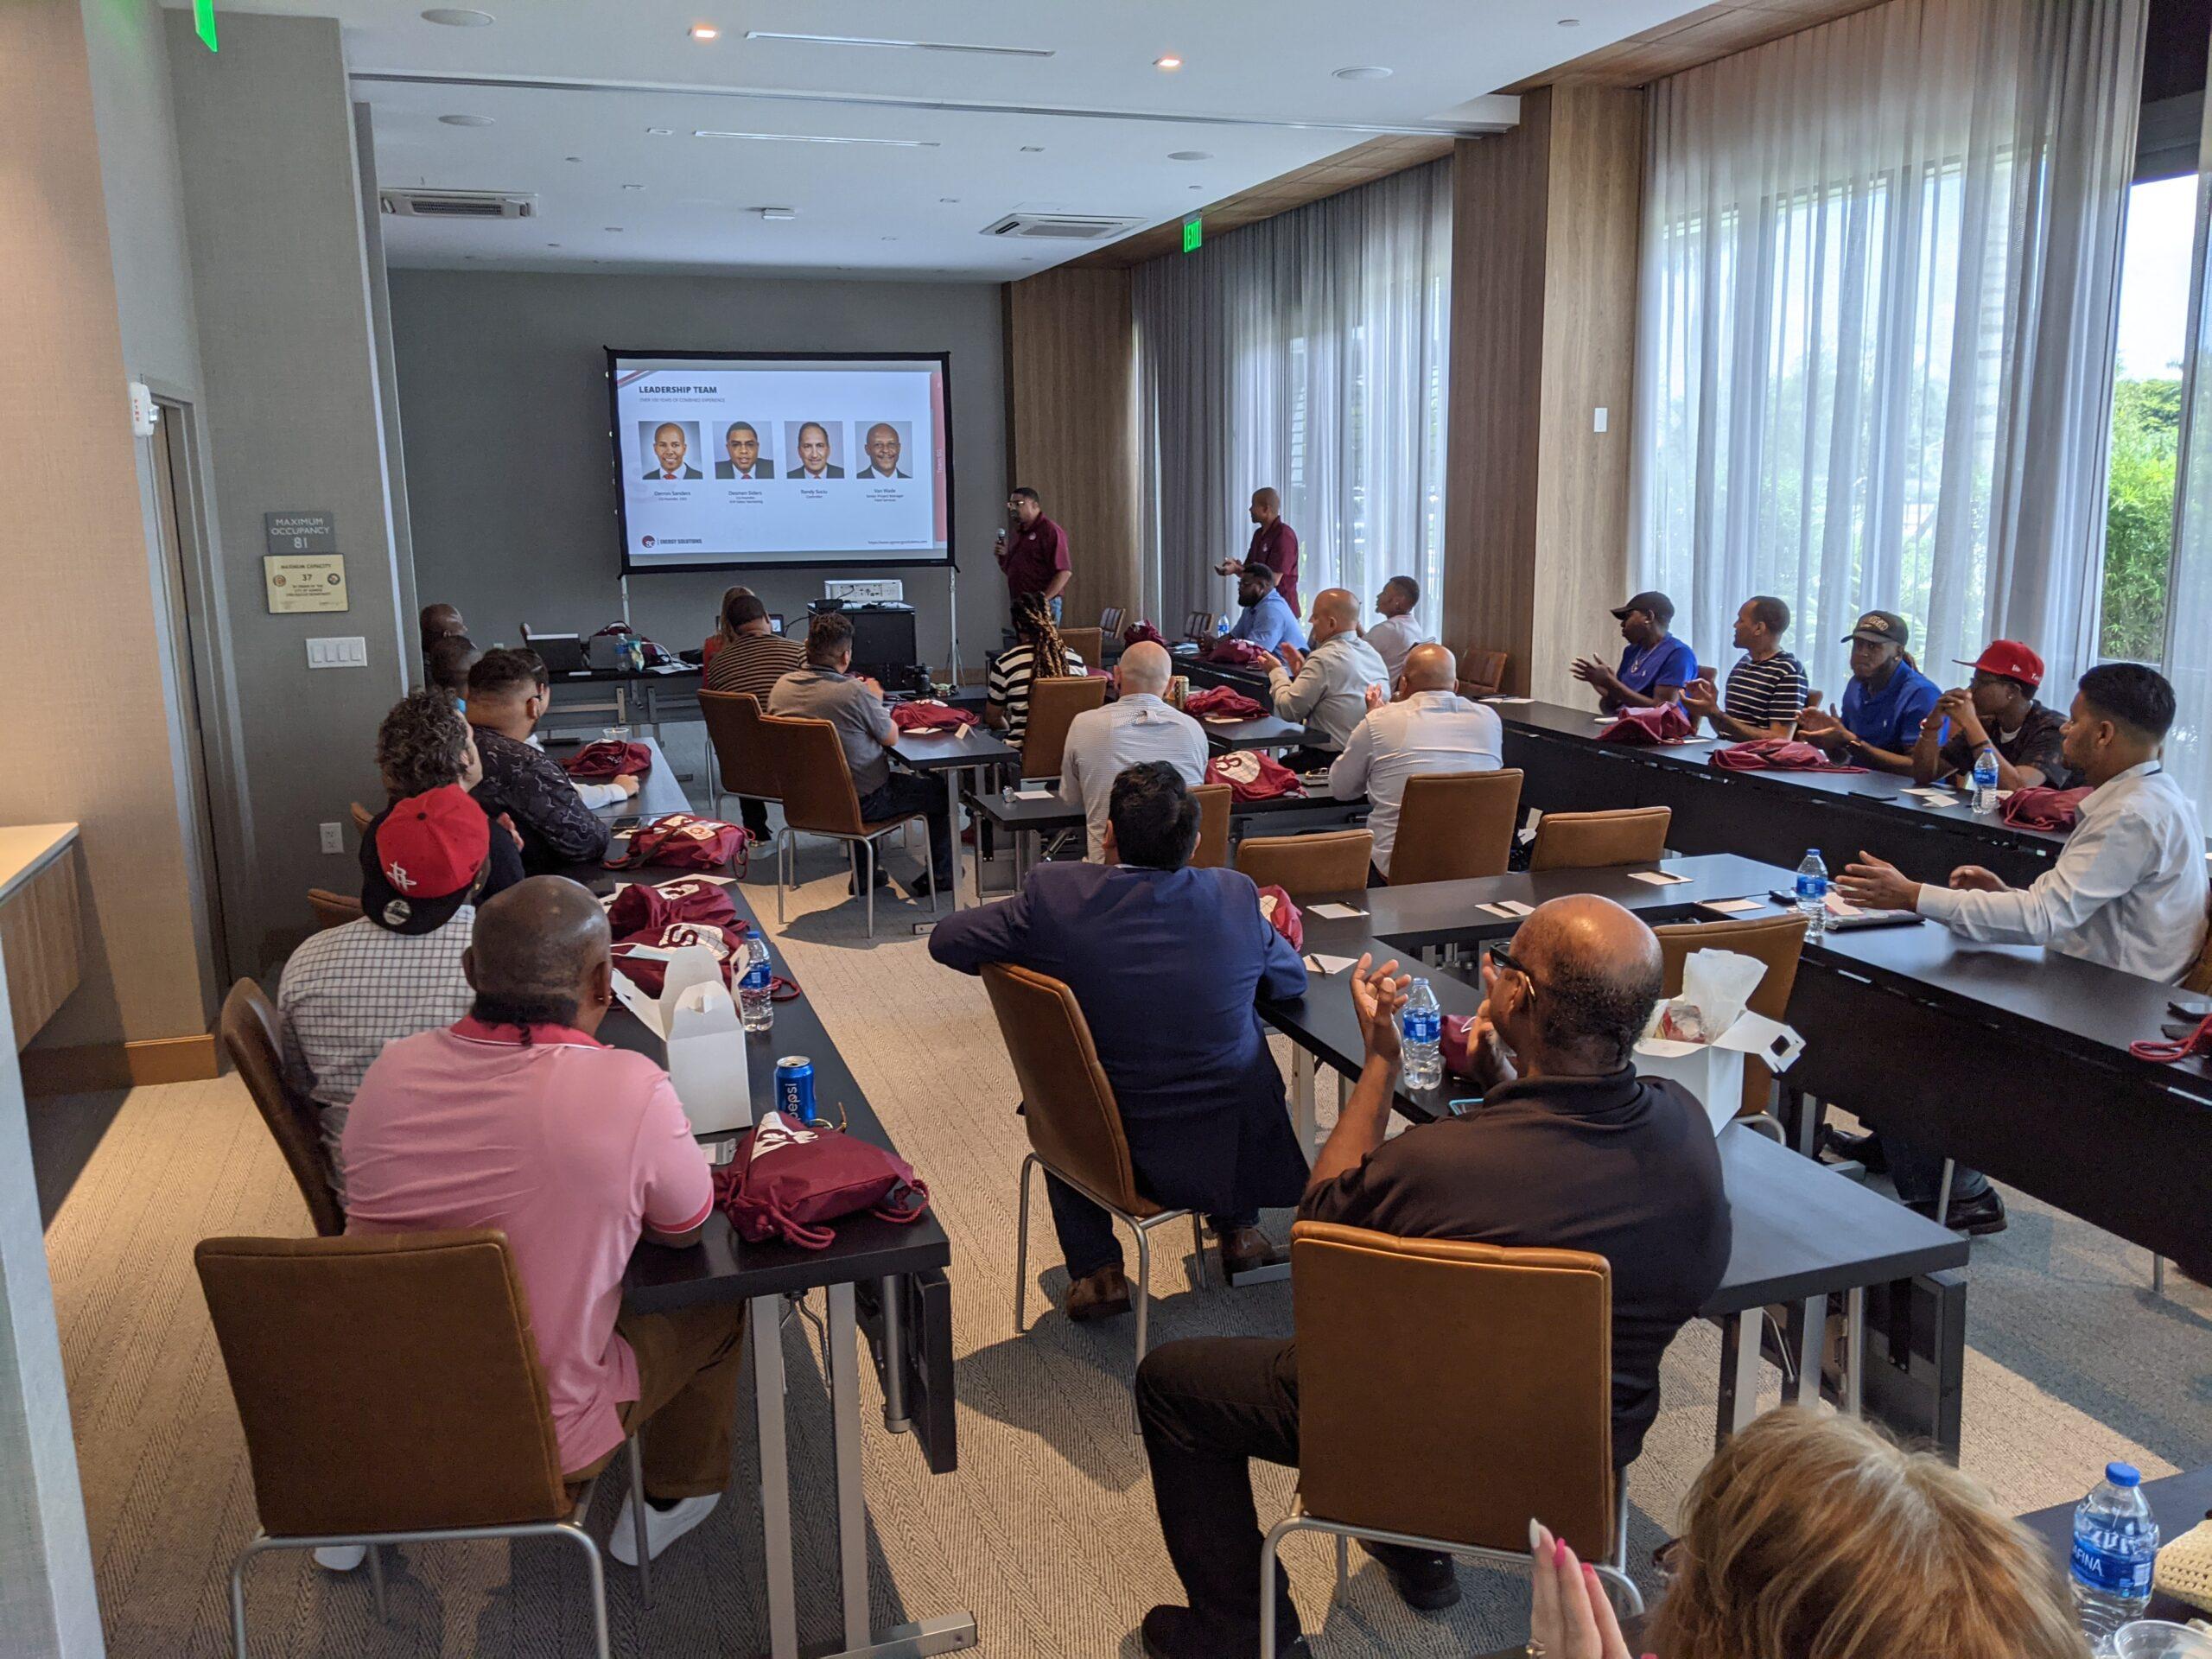 Training session presentation